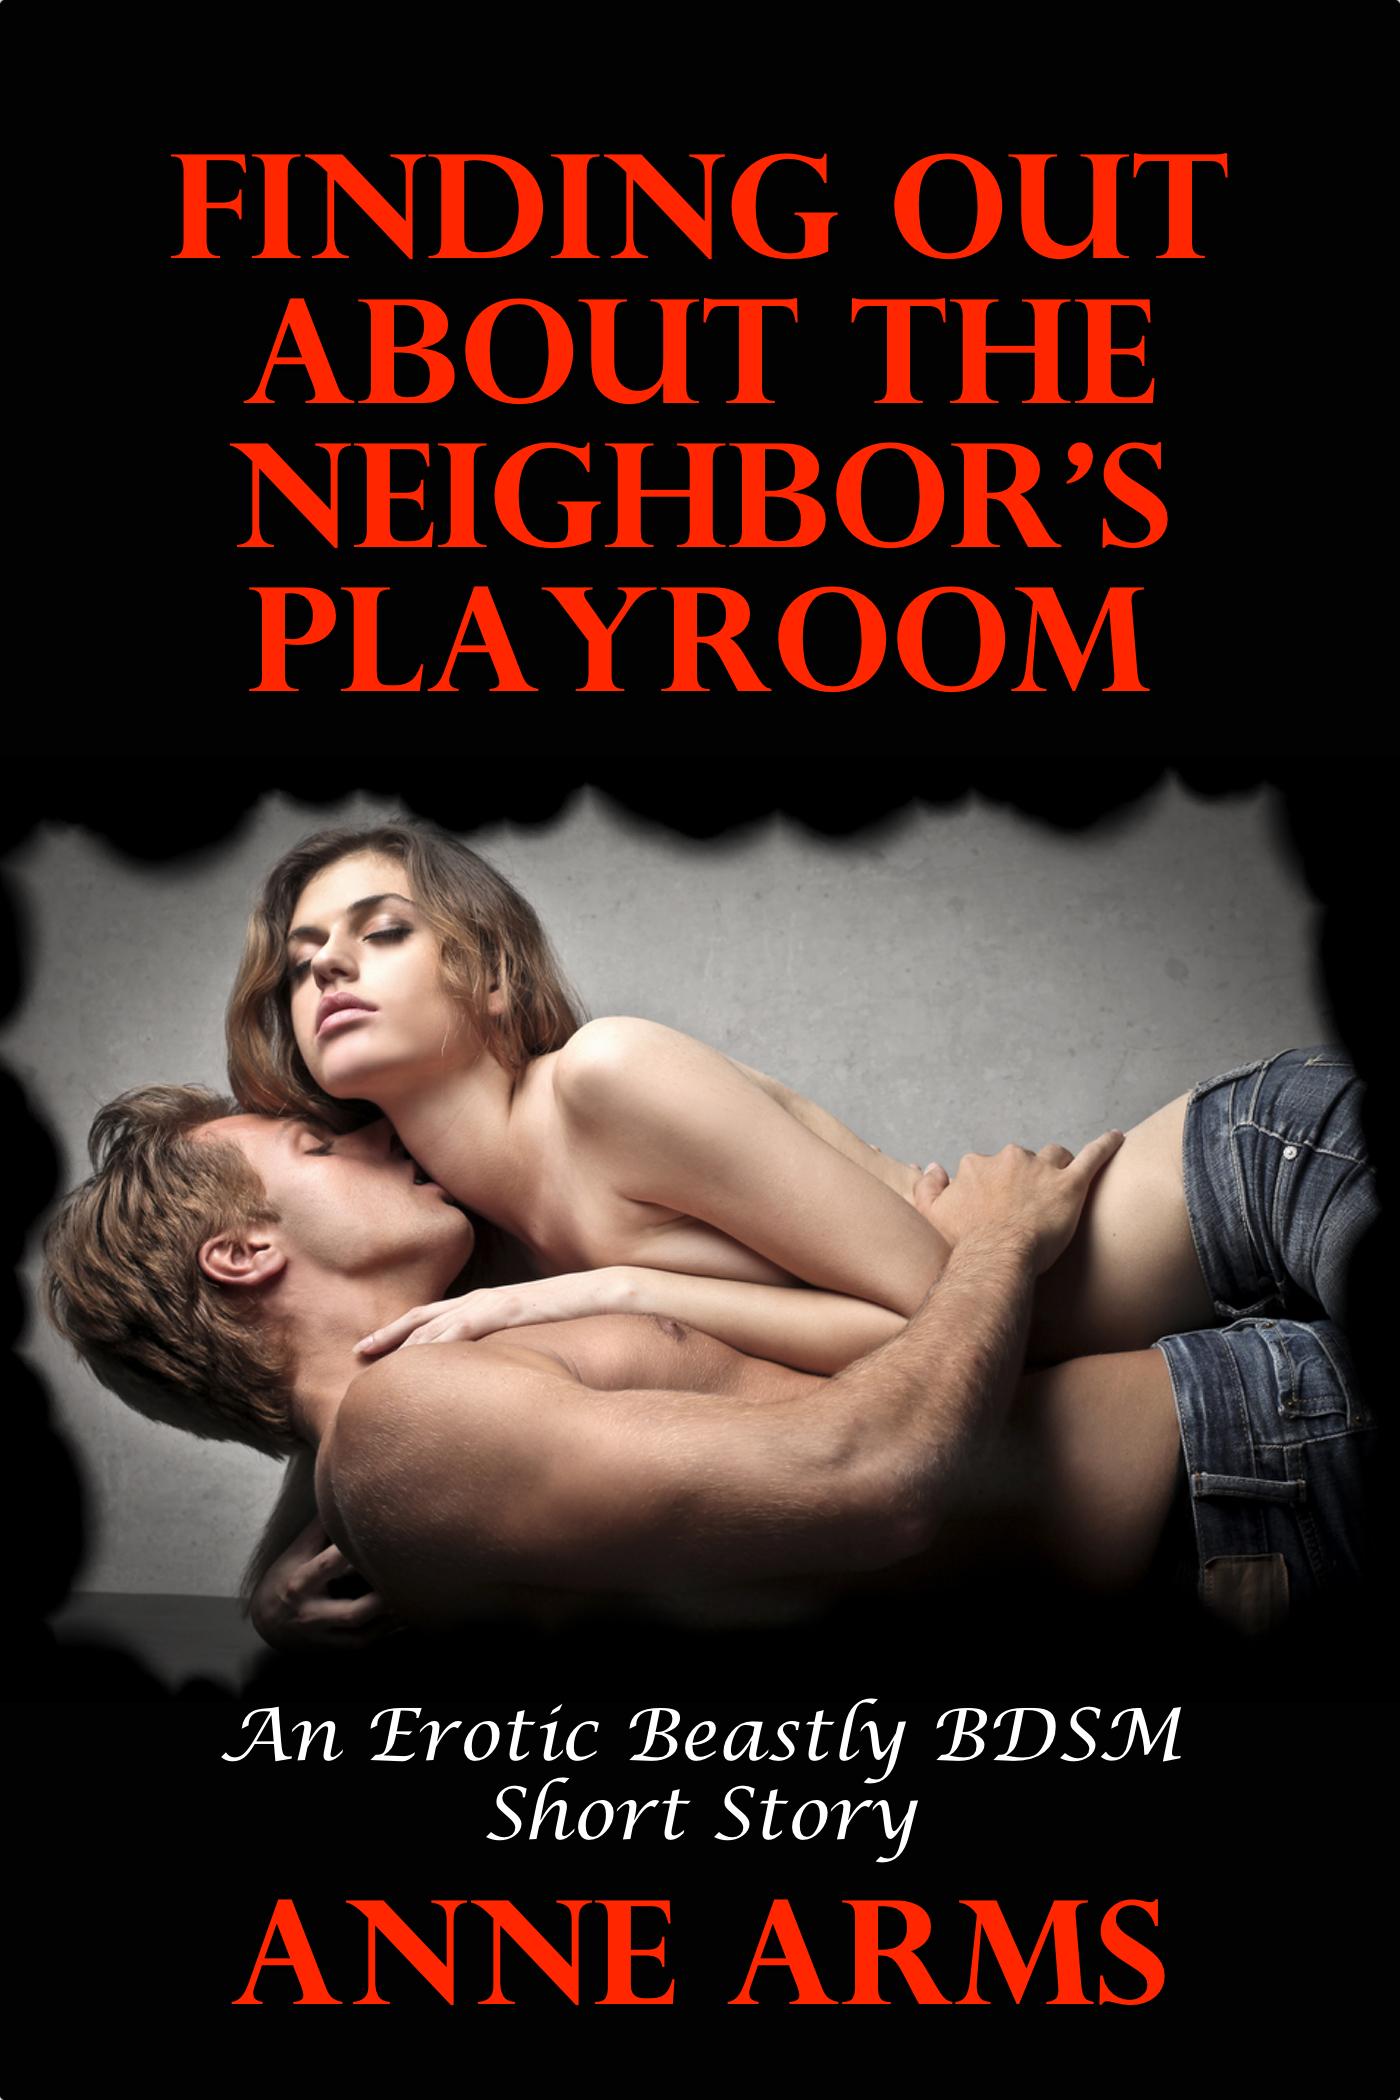 Seedish nudes erotic neighbors stories teen